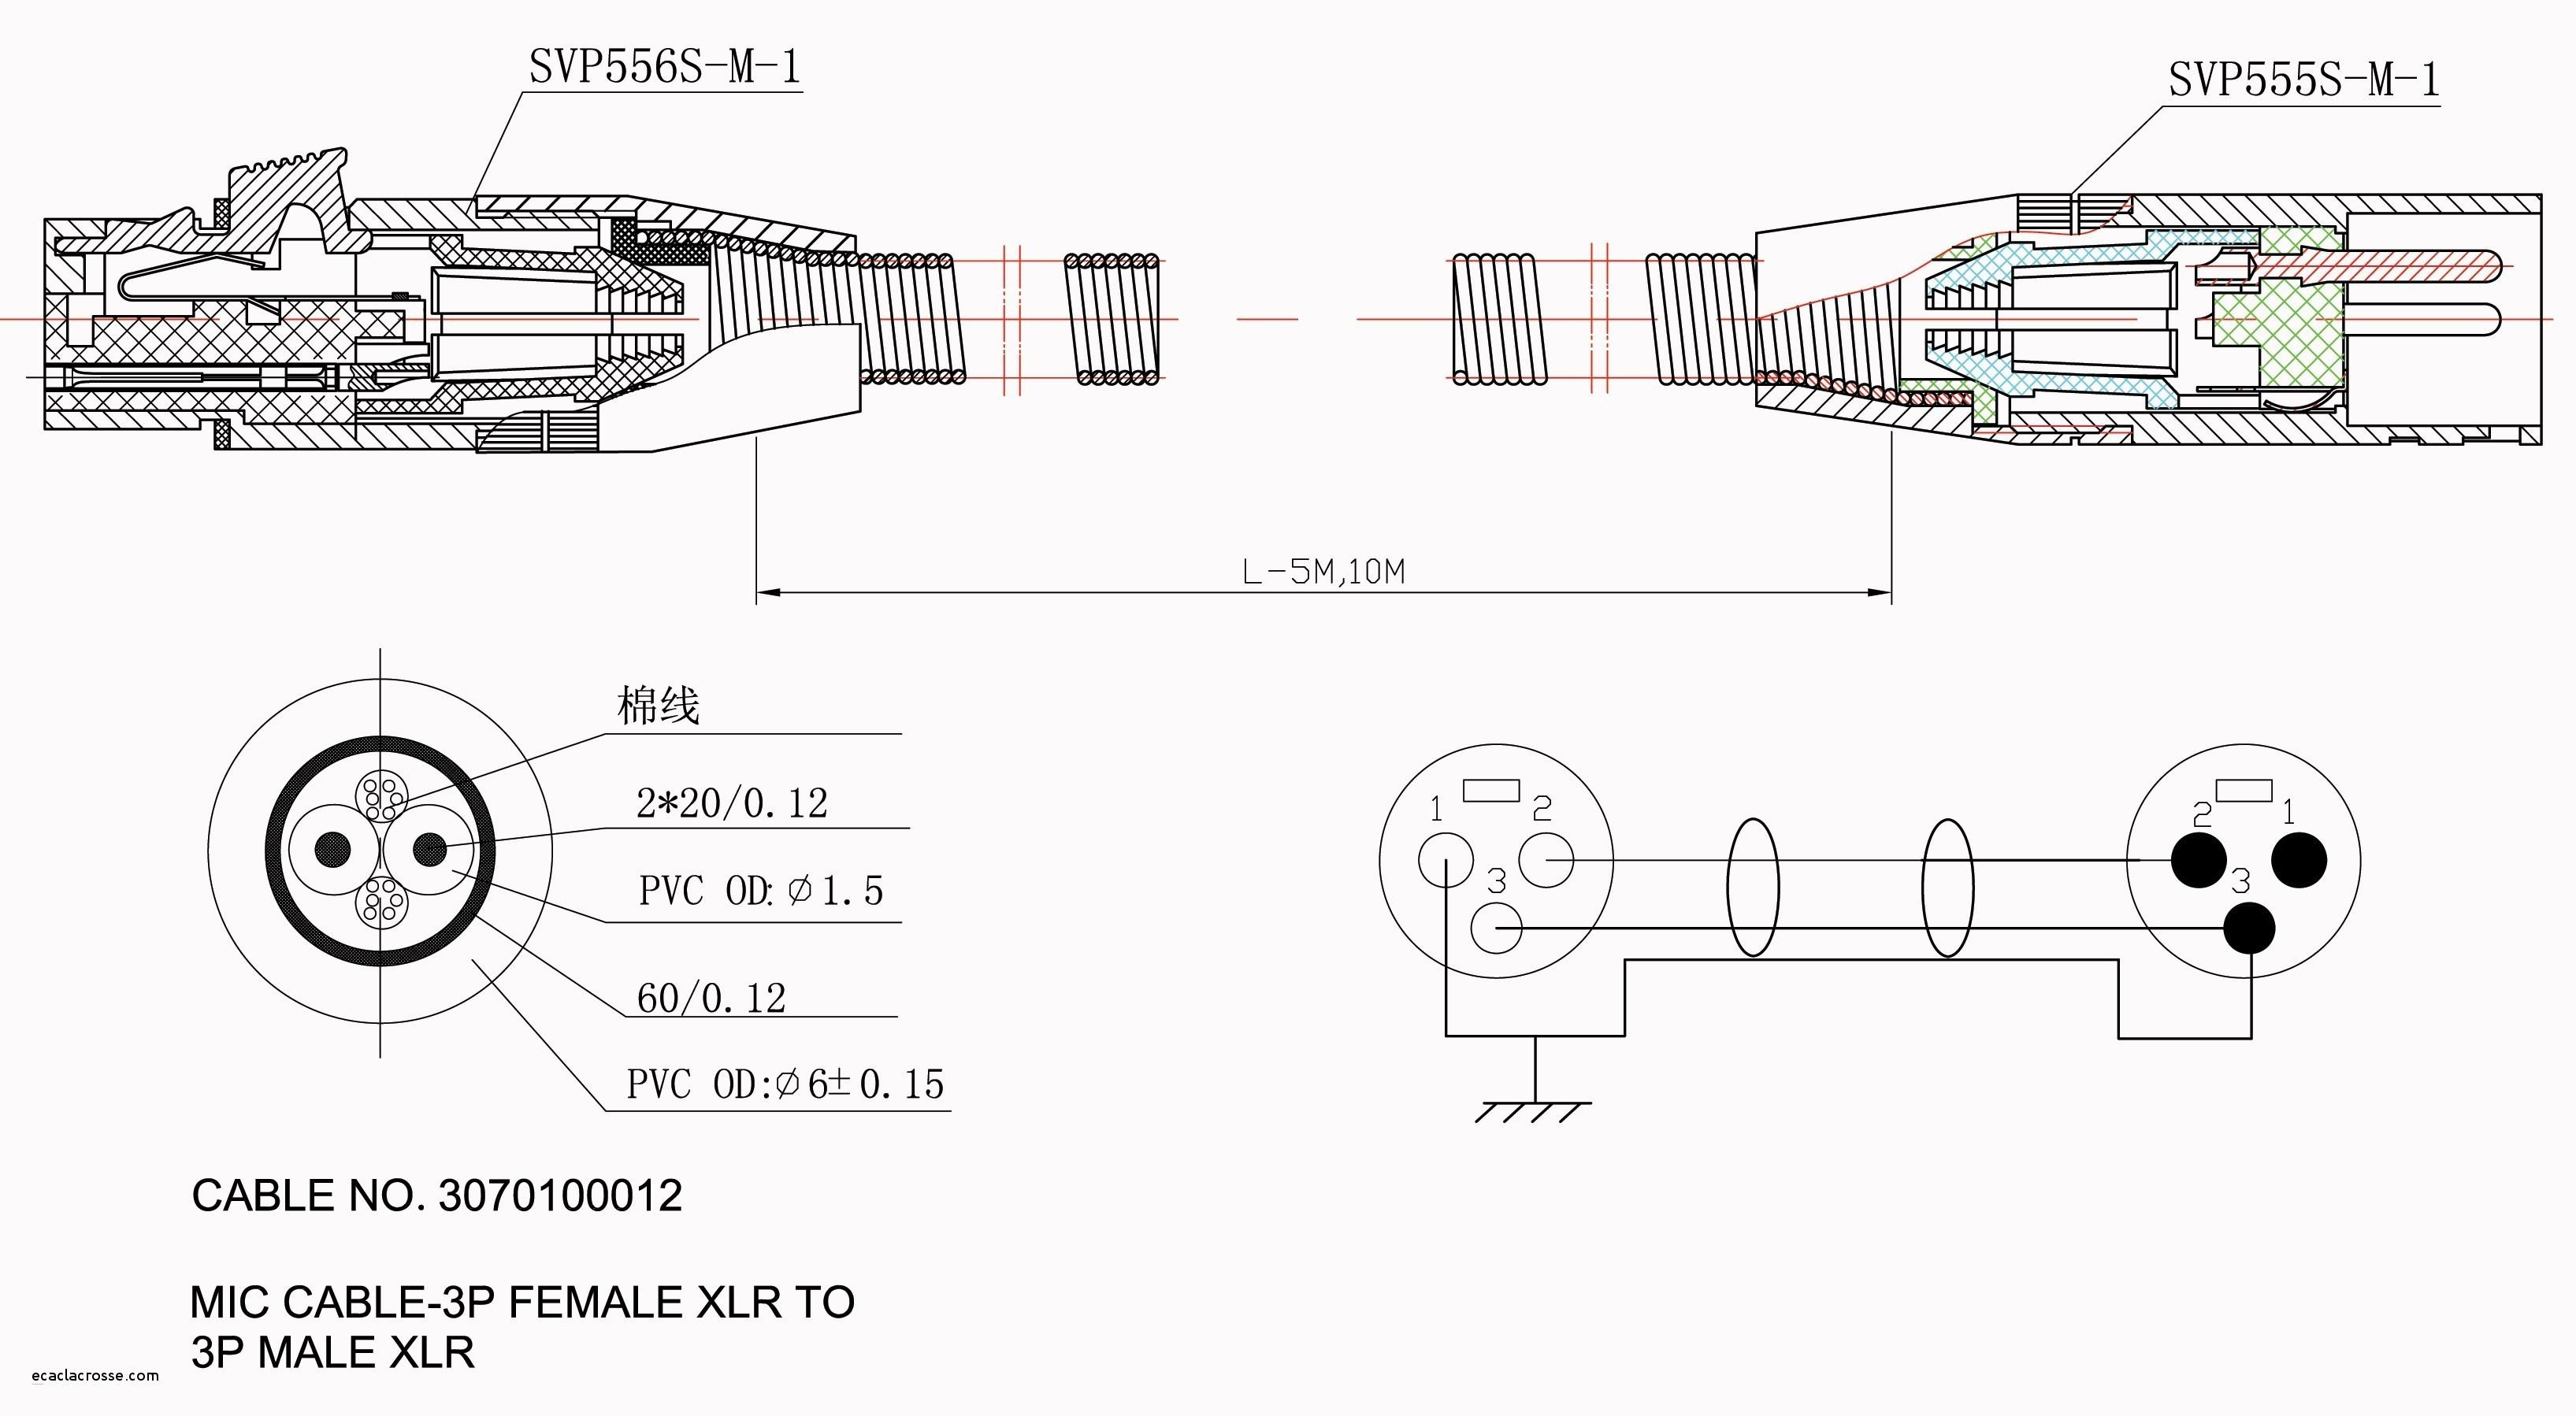 Ohc Engine Diagram Rj45 Wiring Diagram Pdf Experts Wiring Diagram • Of Ohc Engine Diagram